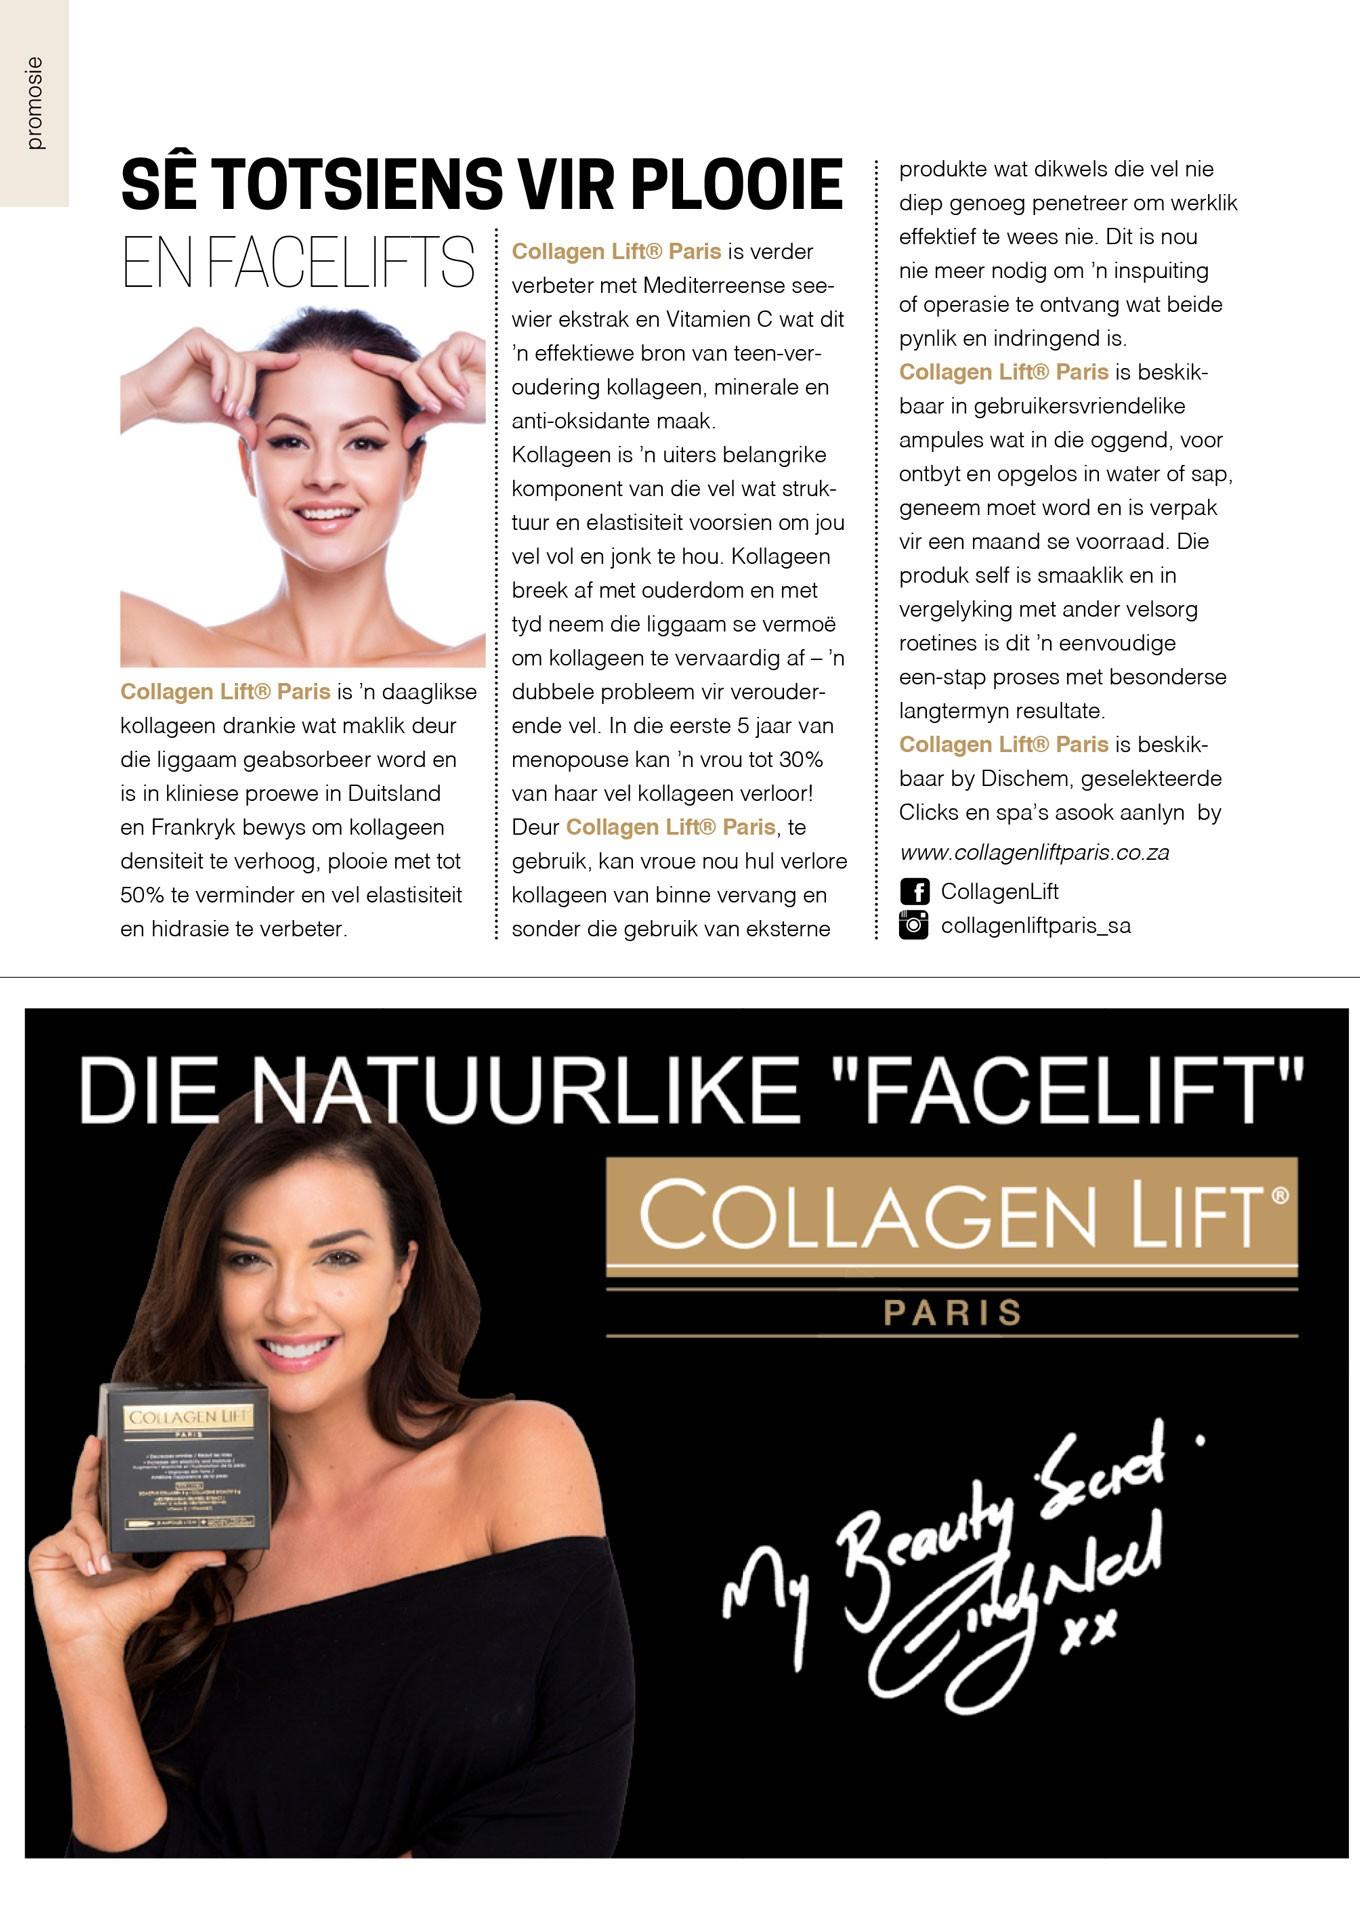 Collagen Media Release